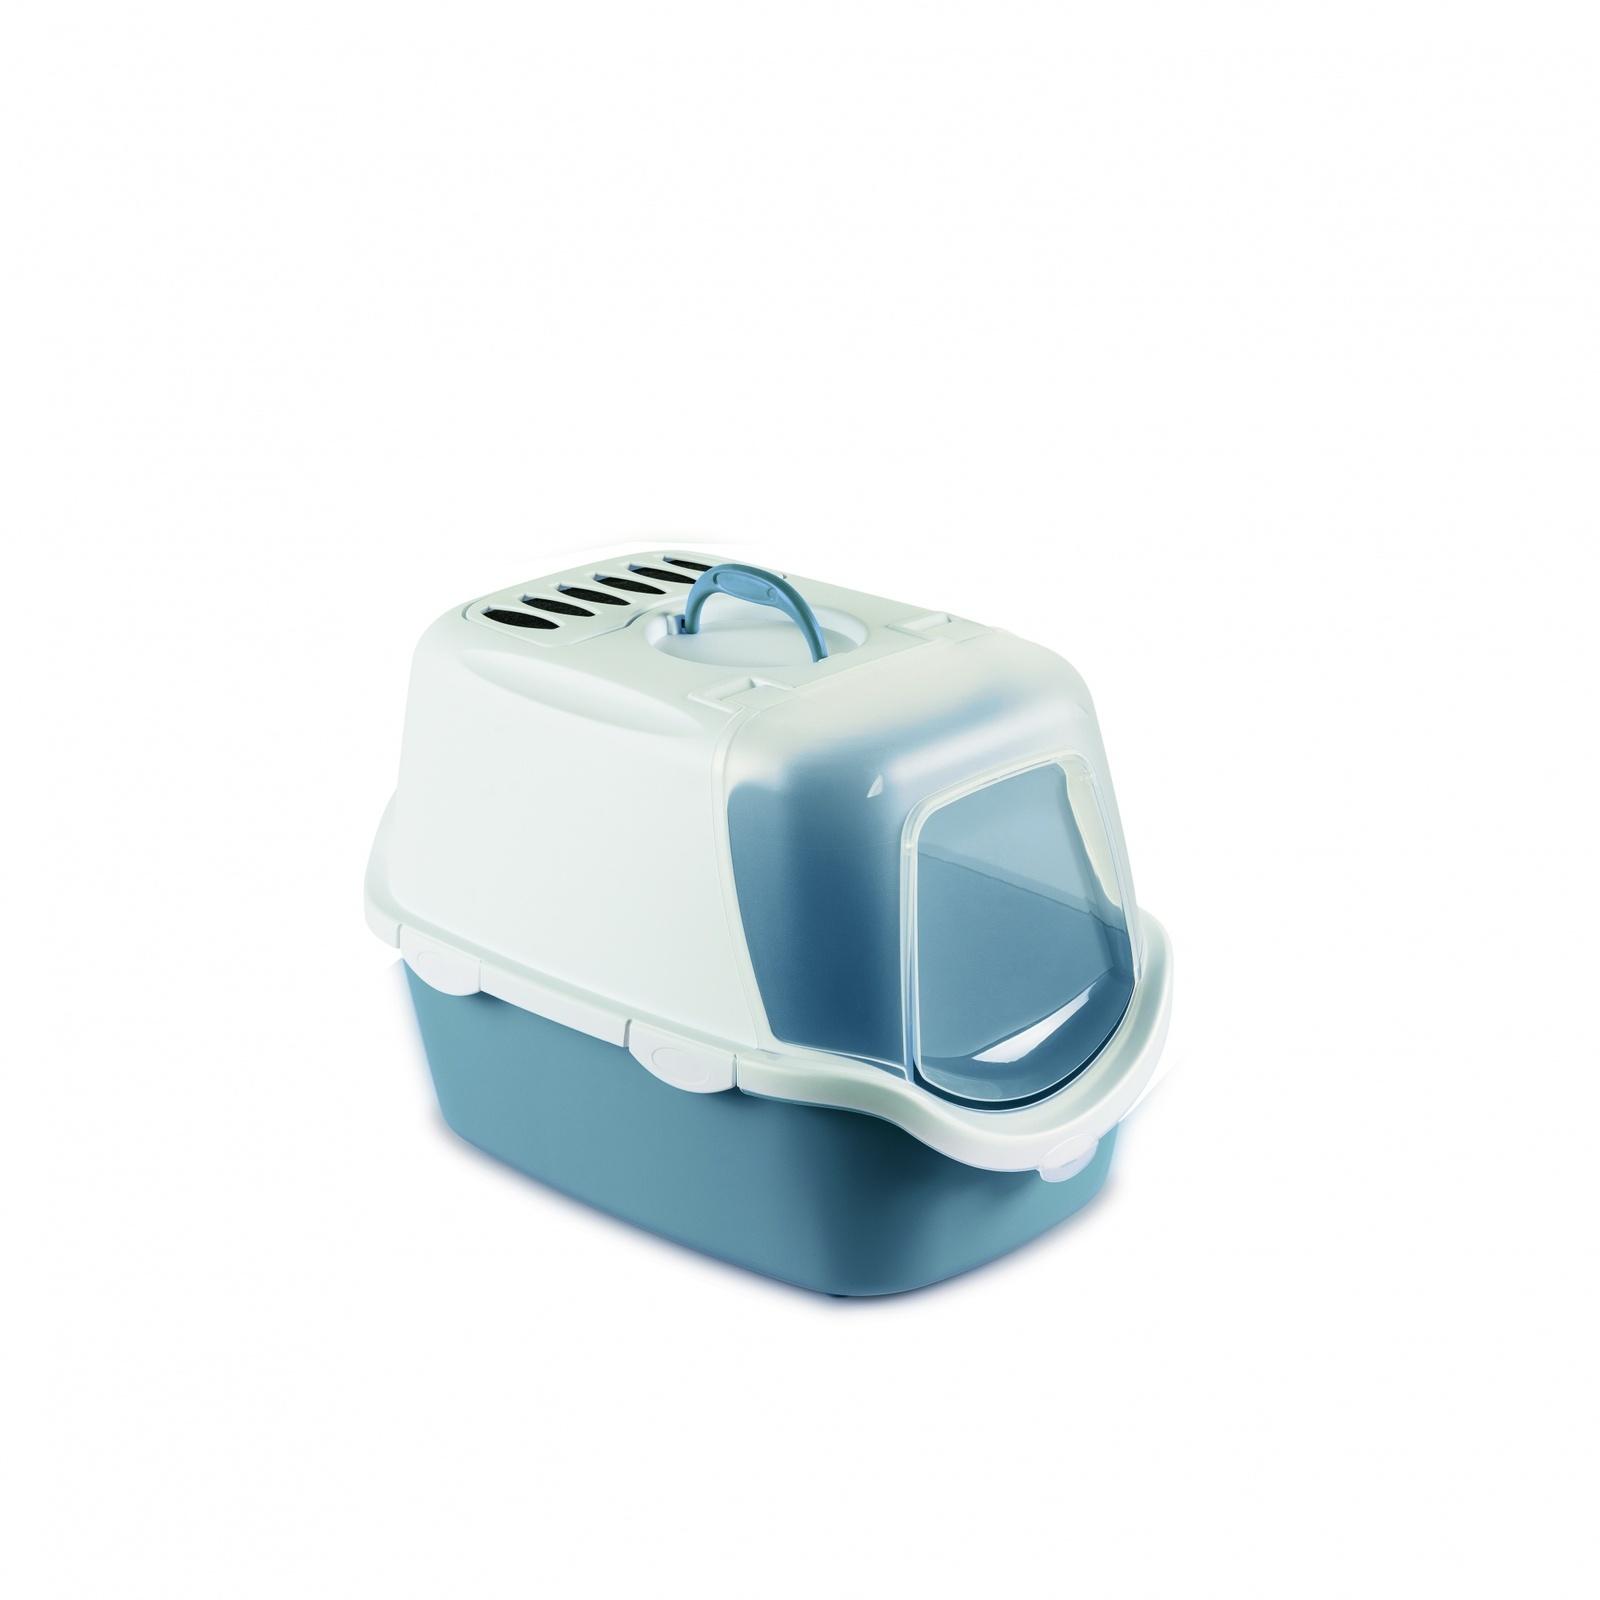 Stefanplast Туалет-Домик Cathy Easy Clean с угольным фильтром, синий, 56х40х40 см (1,6 кг)